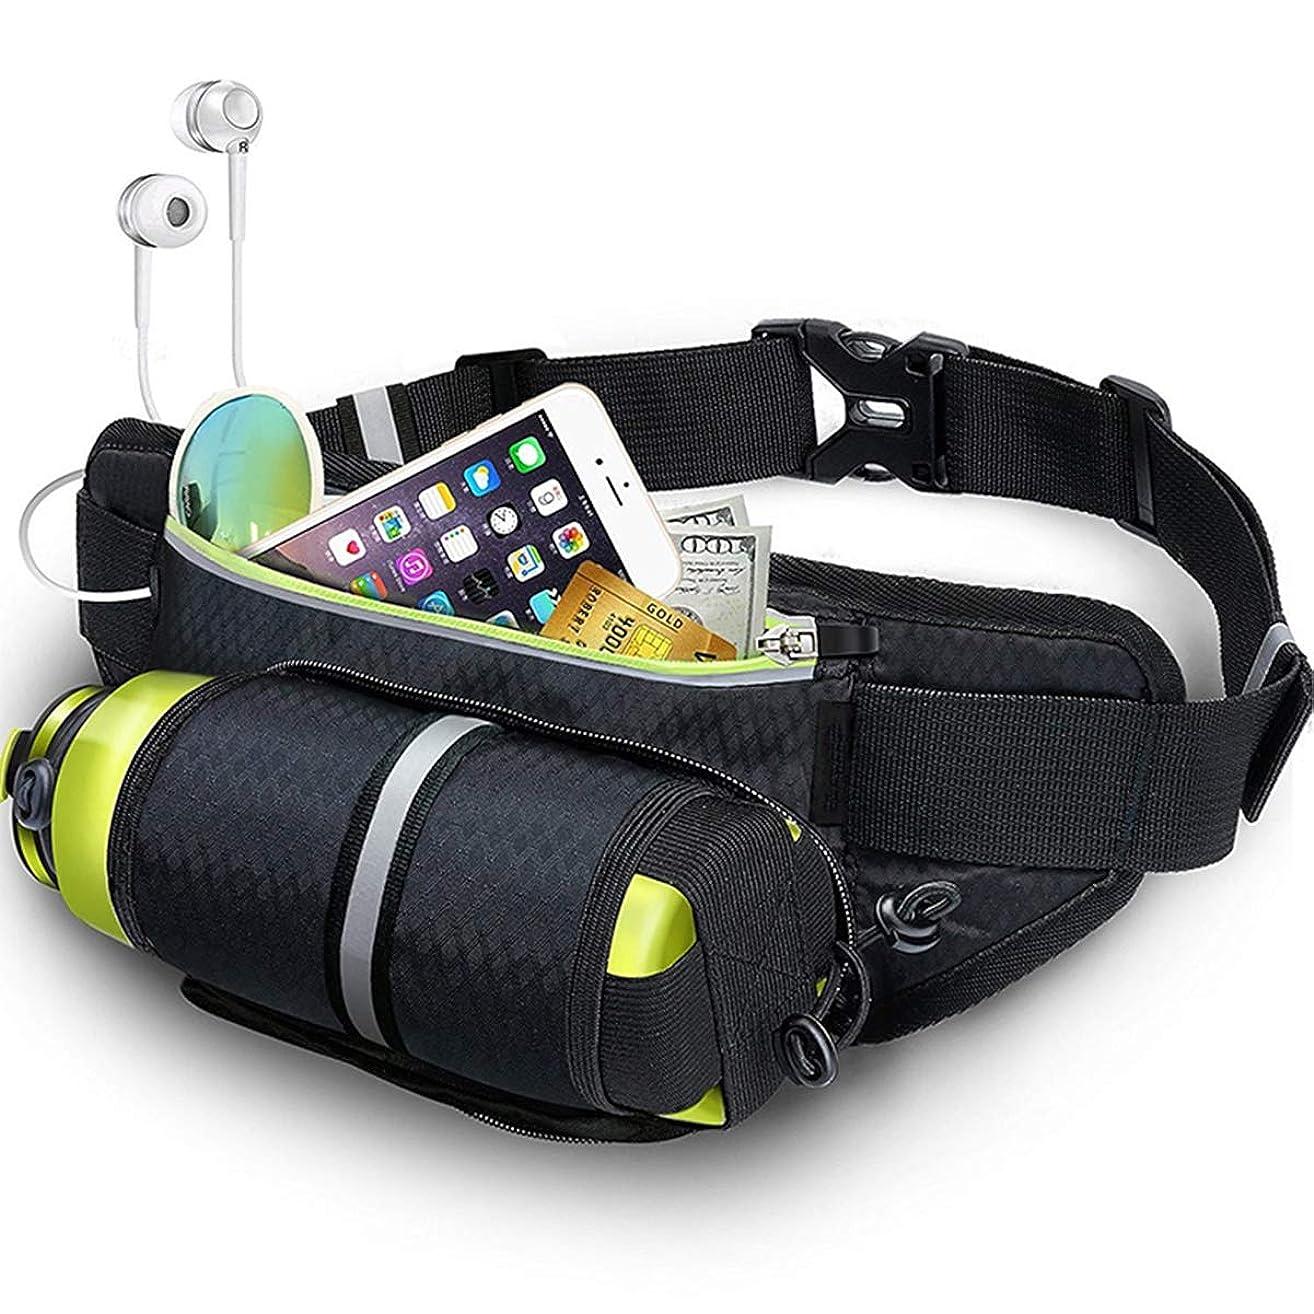 GrandSiri 1 Pack Gym Fitness Sports Belt Waist Waterproof Running Bag Small Water Bottle Key Keychain Phone Plus Walking Apogee Popular Men Crossbody Shoulder Arm Bum Bags